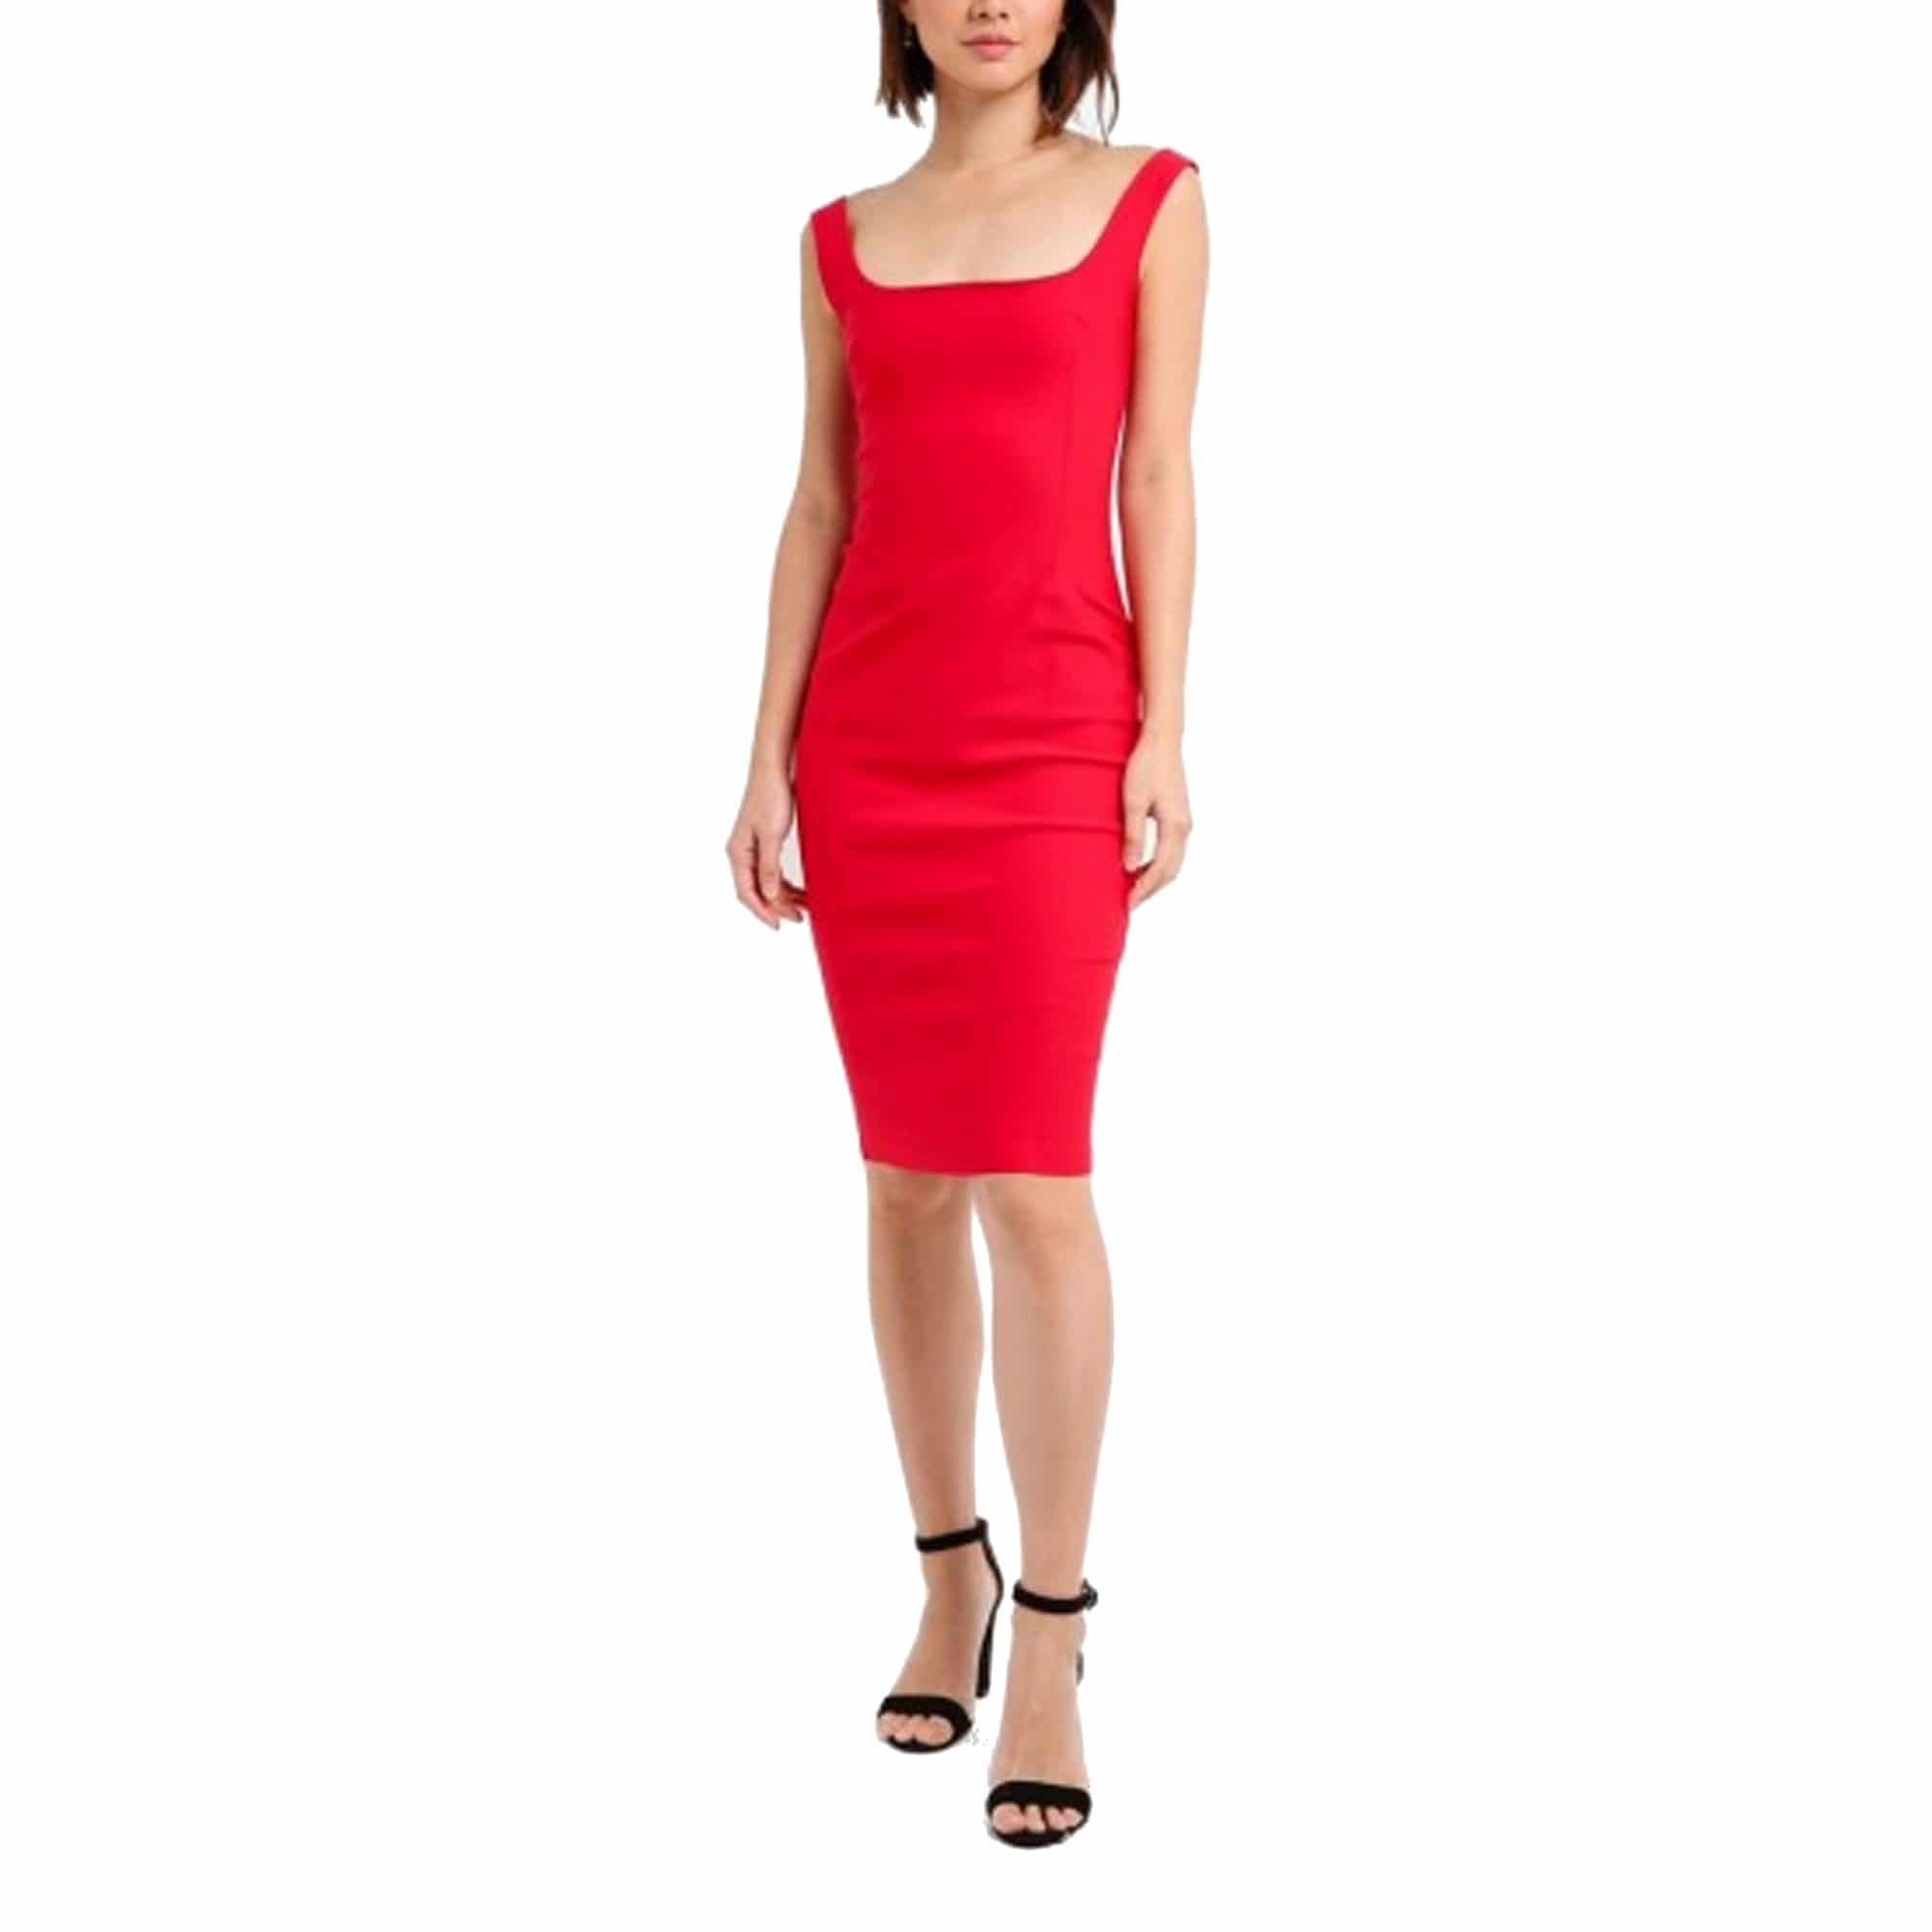 Vesper Red Dress review by Ashley Brooke Designs @ashleybrooke